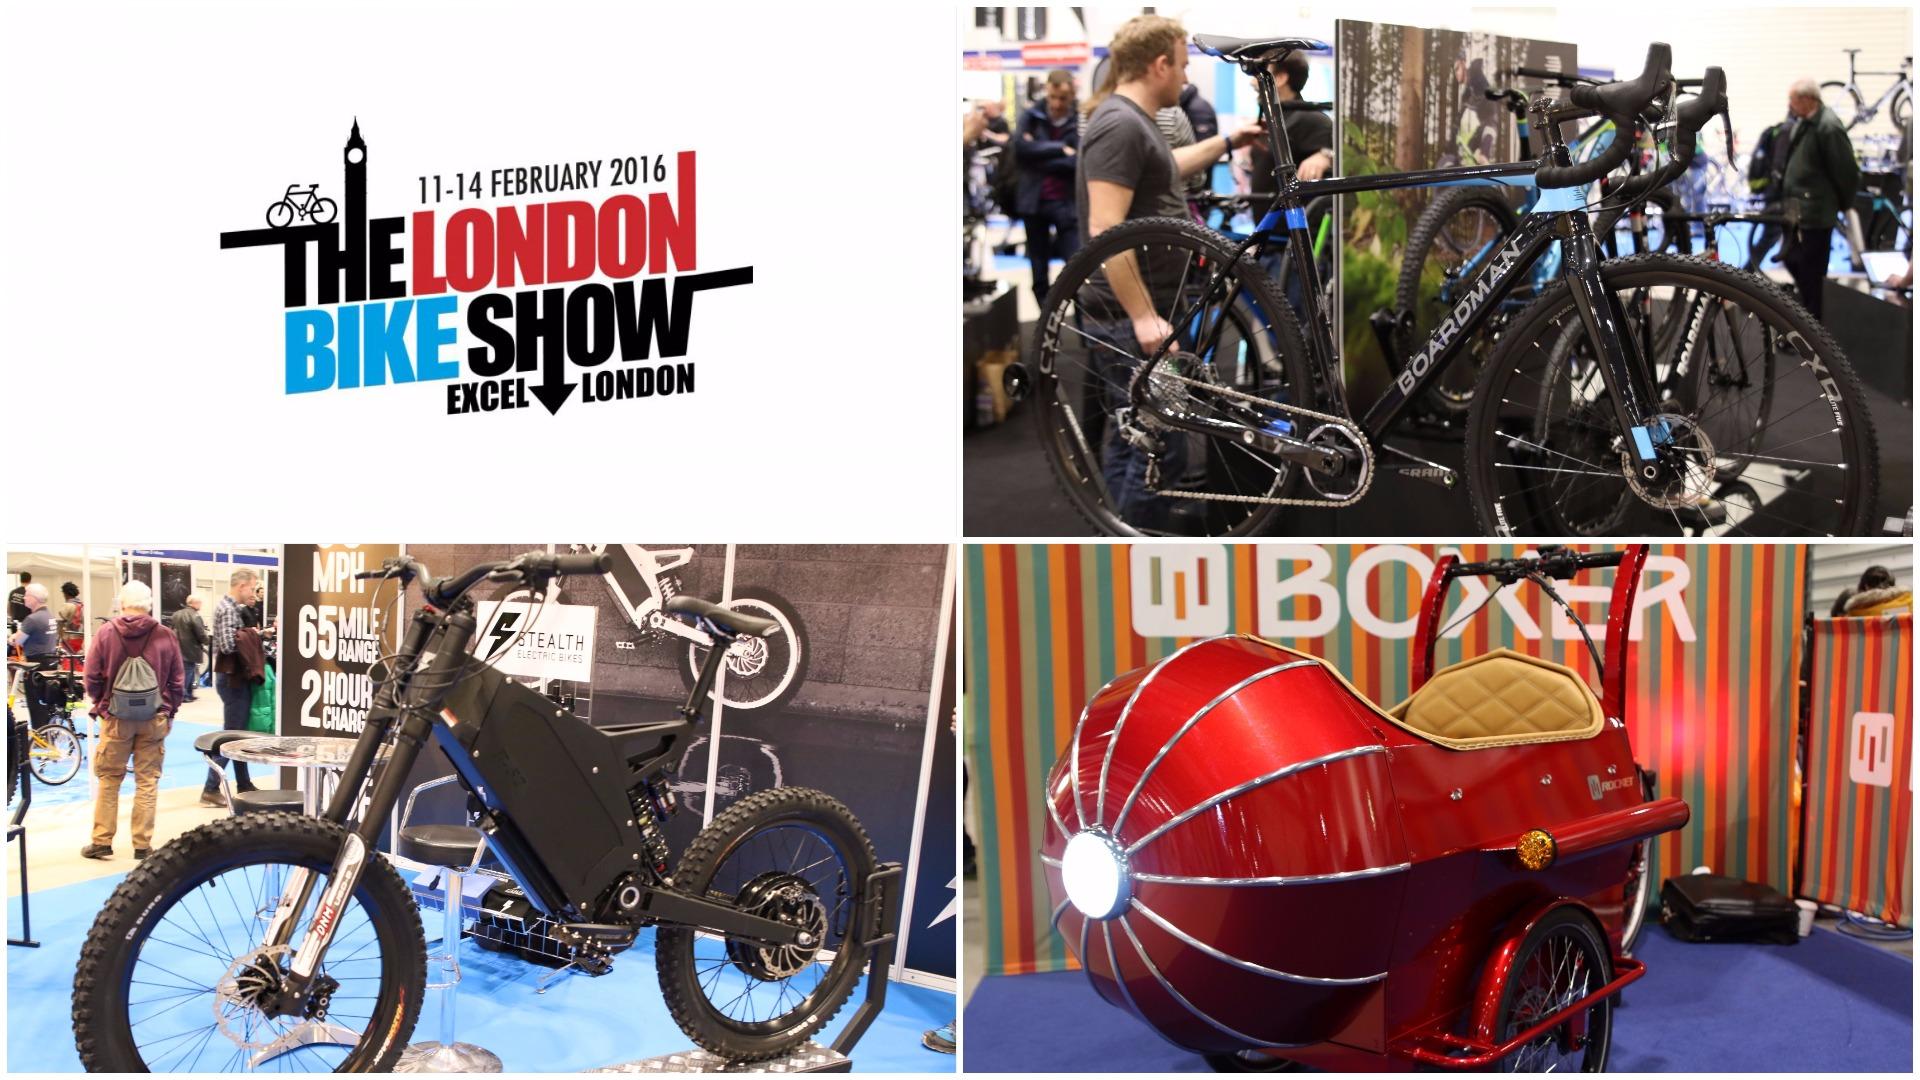 London Bike Show 2016 – The Highlights